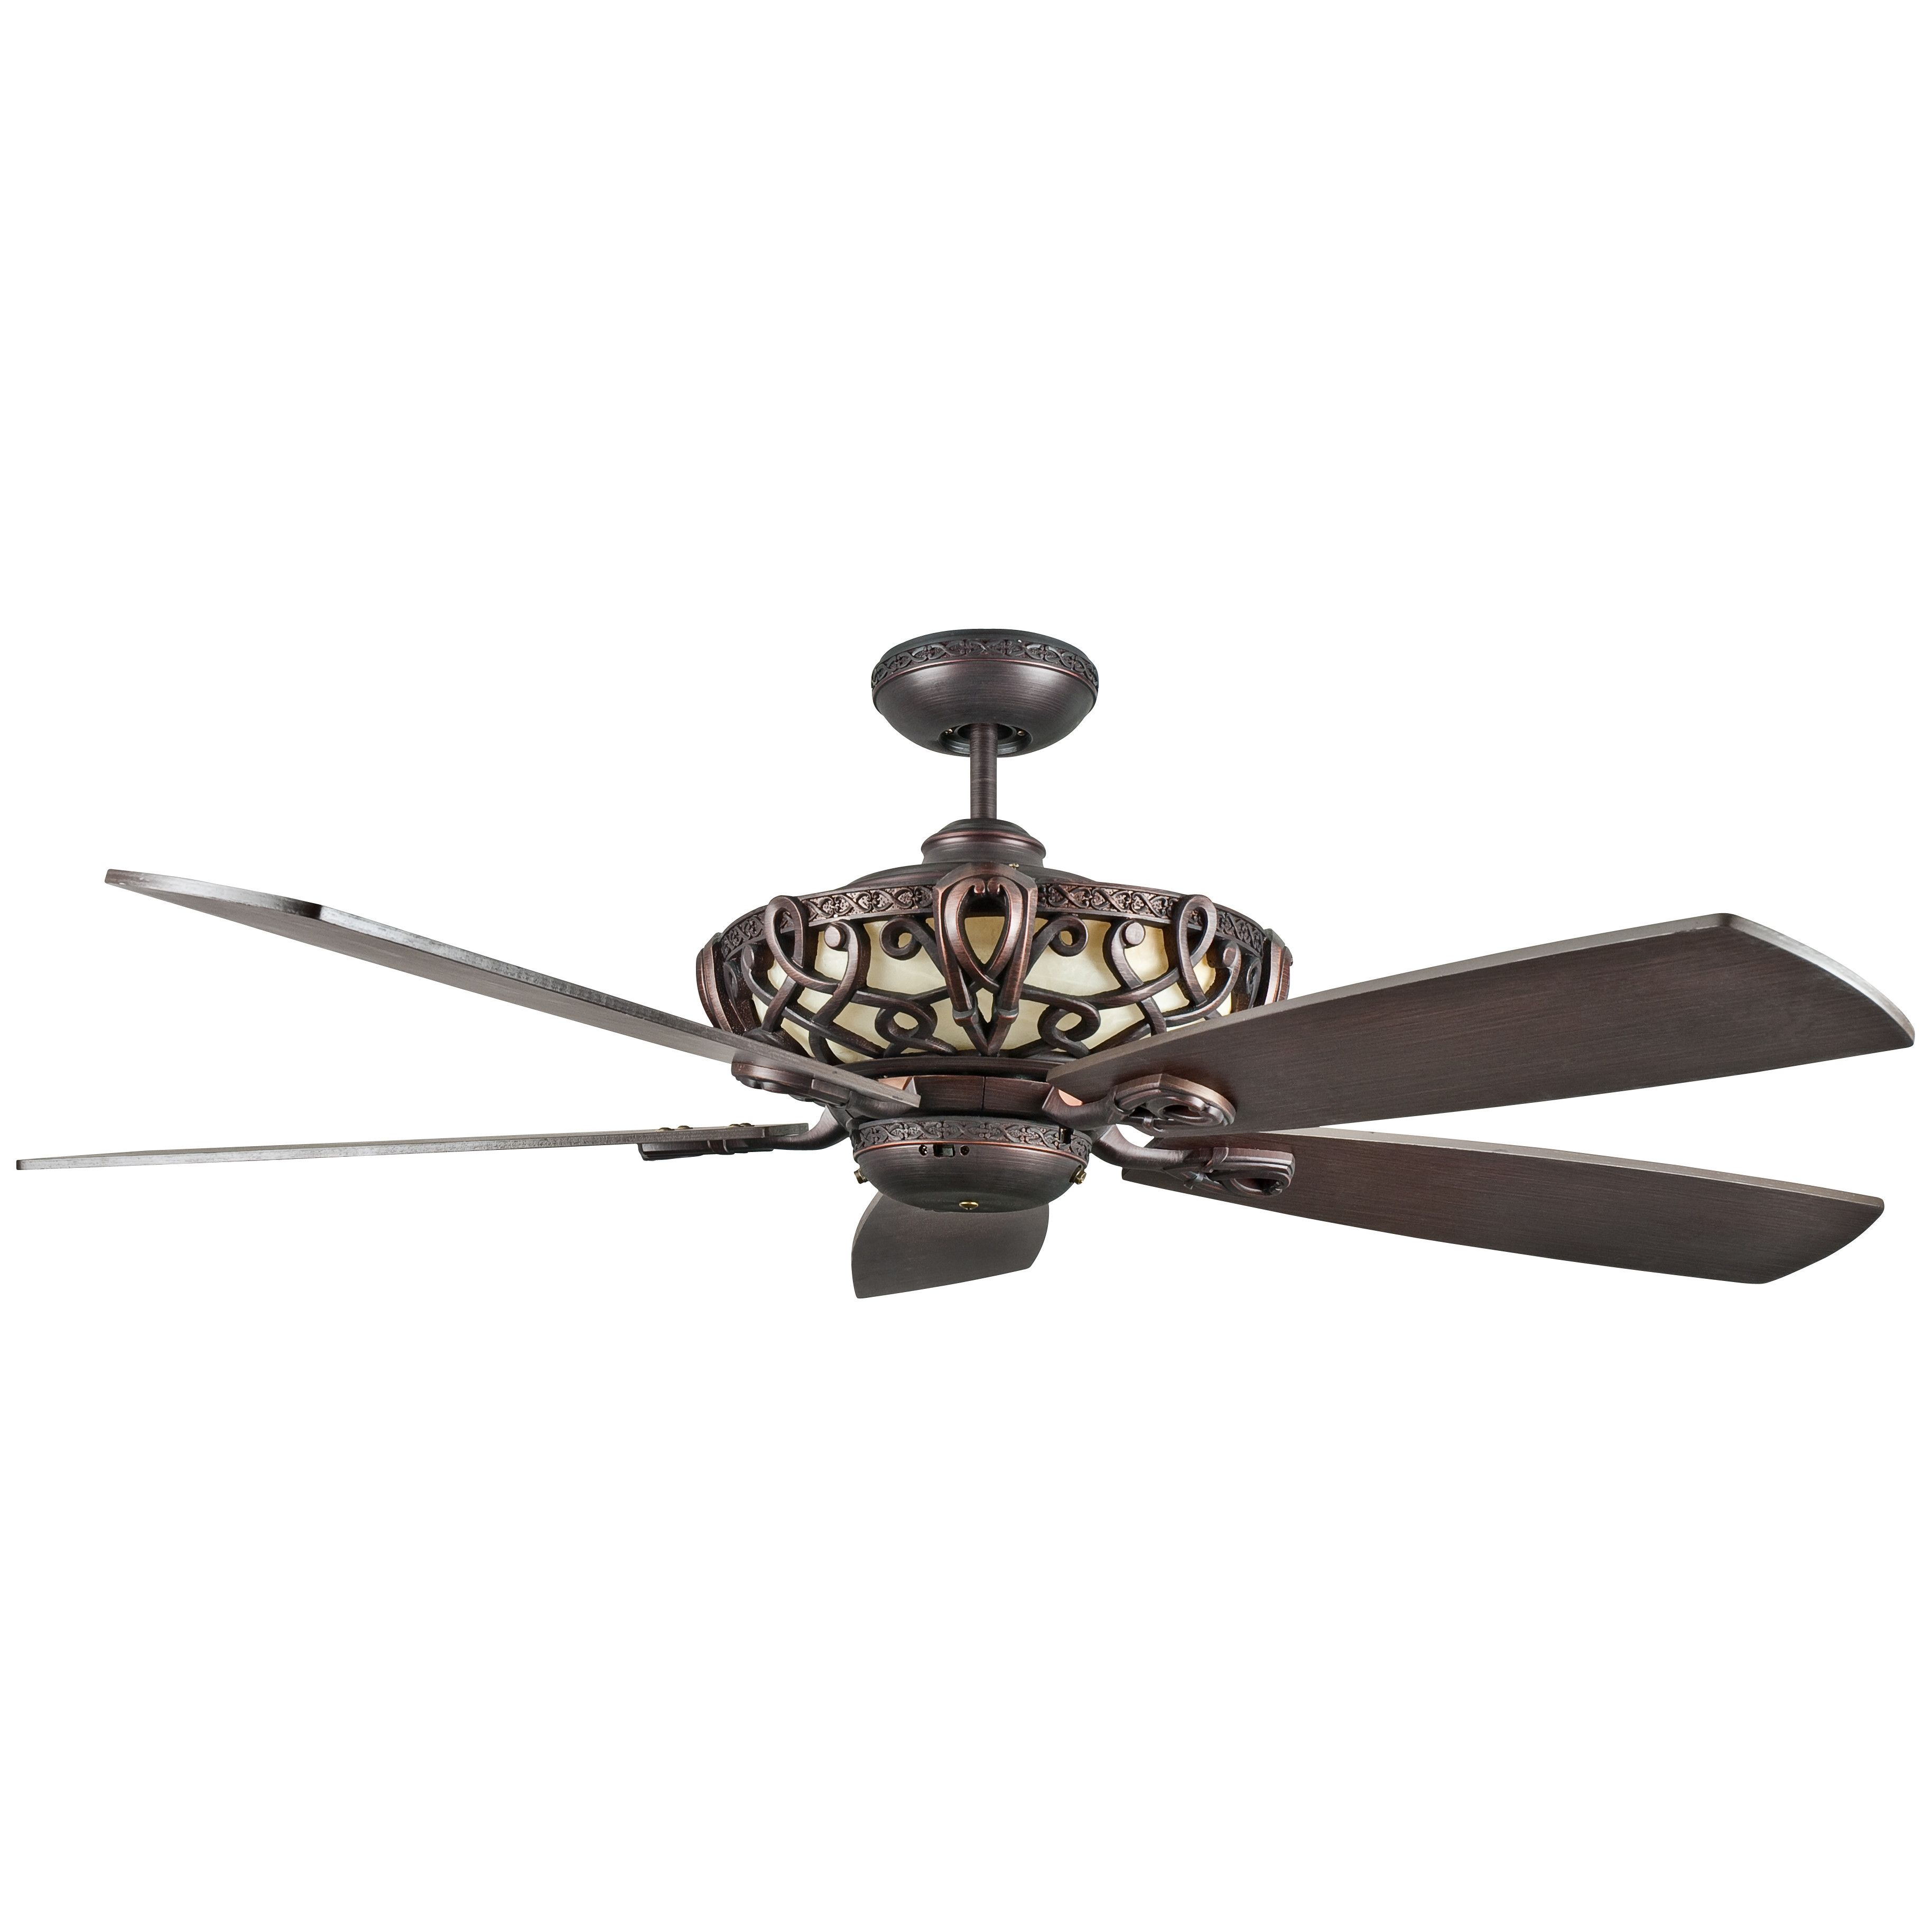 "Concord Fans 60"" Aracruz 5 Blade Ceiling Fan"